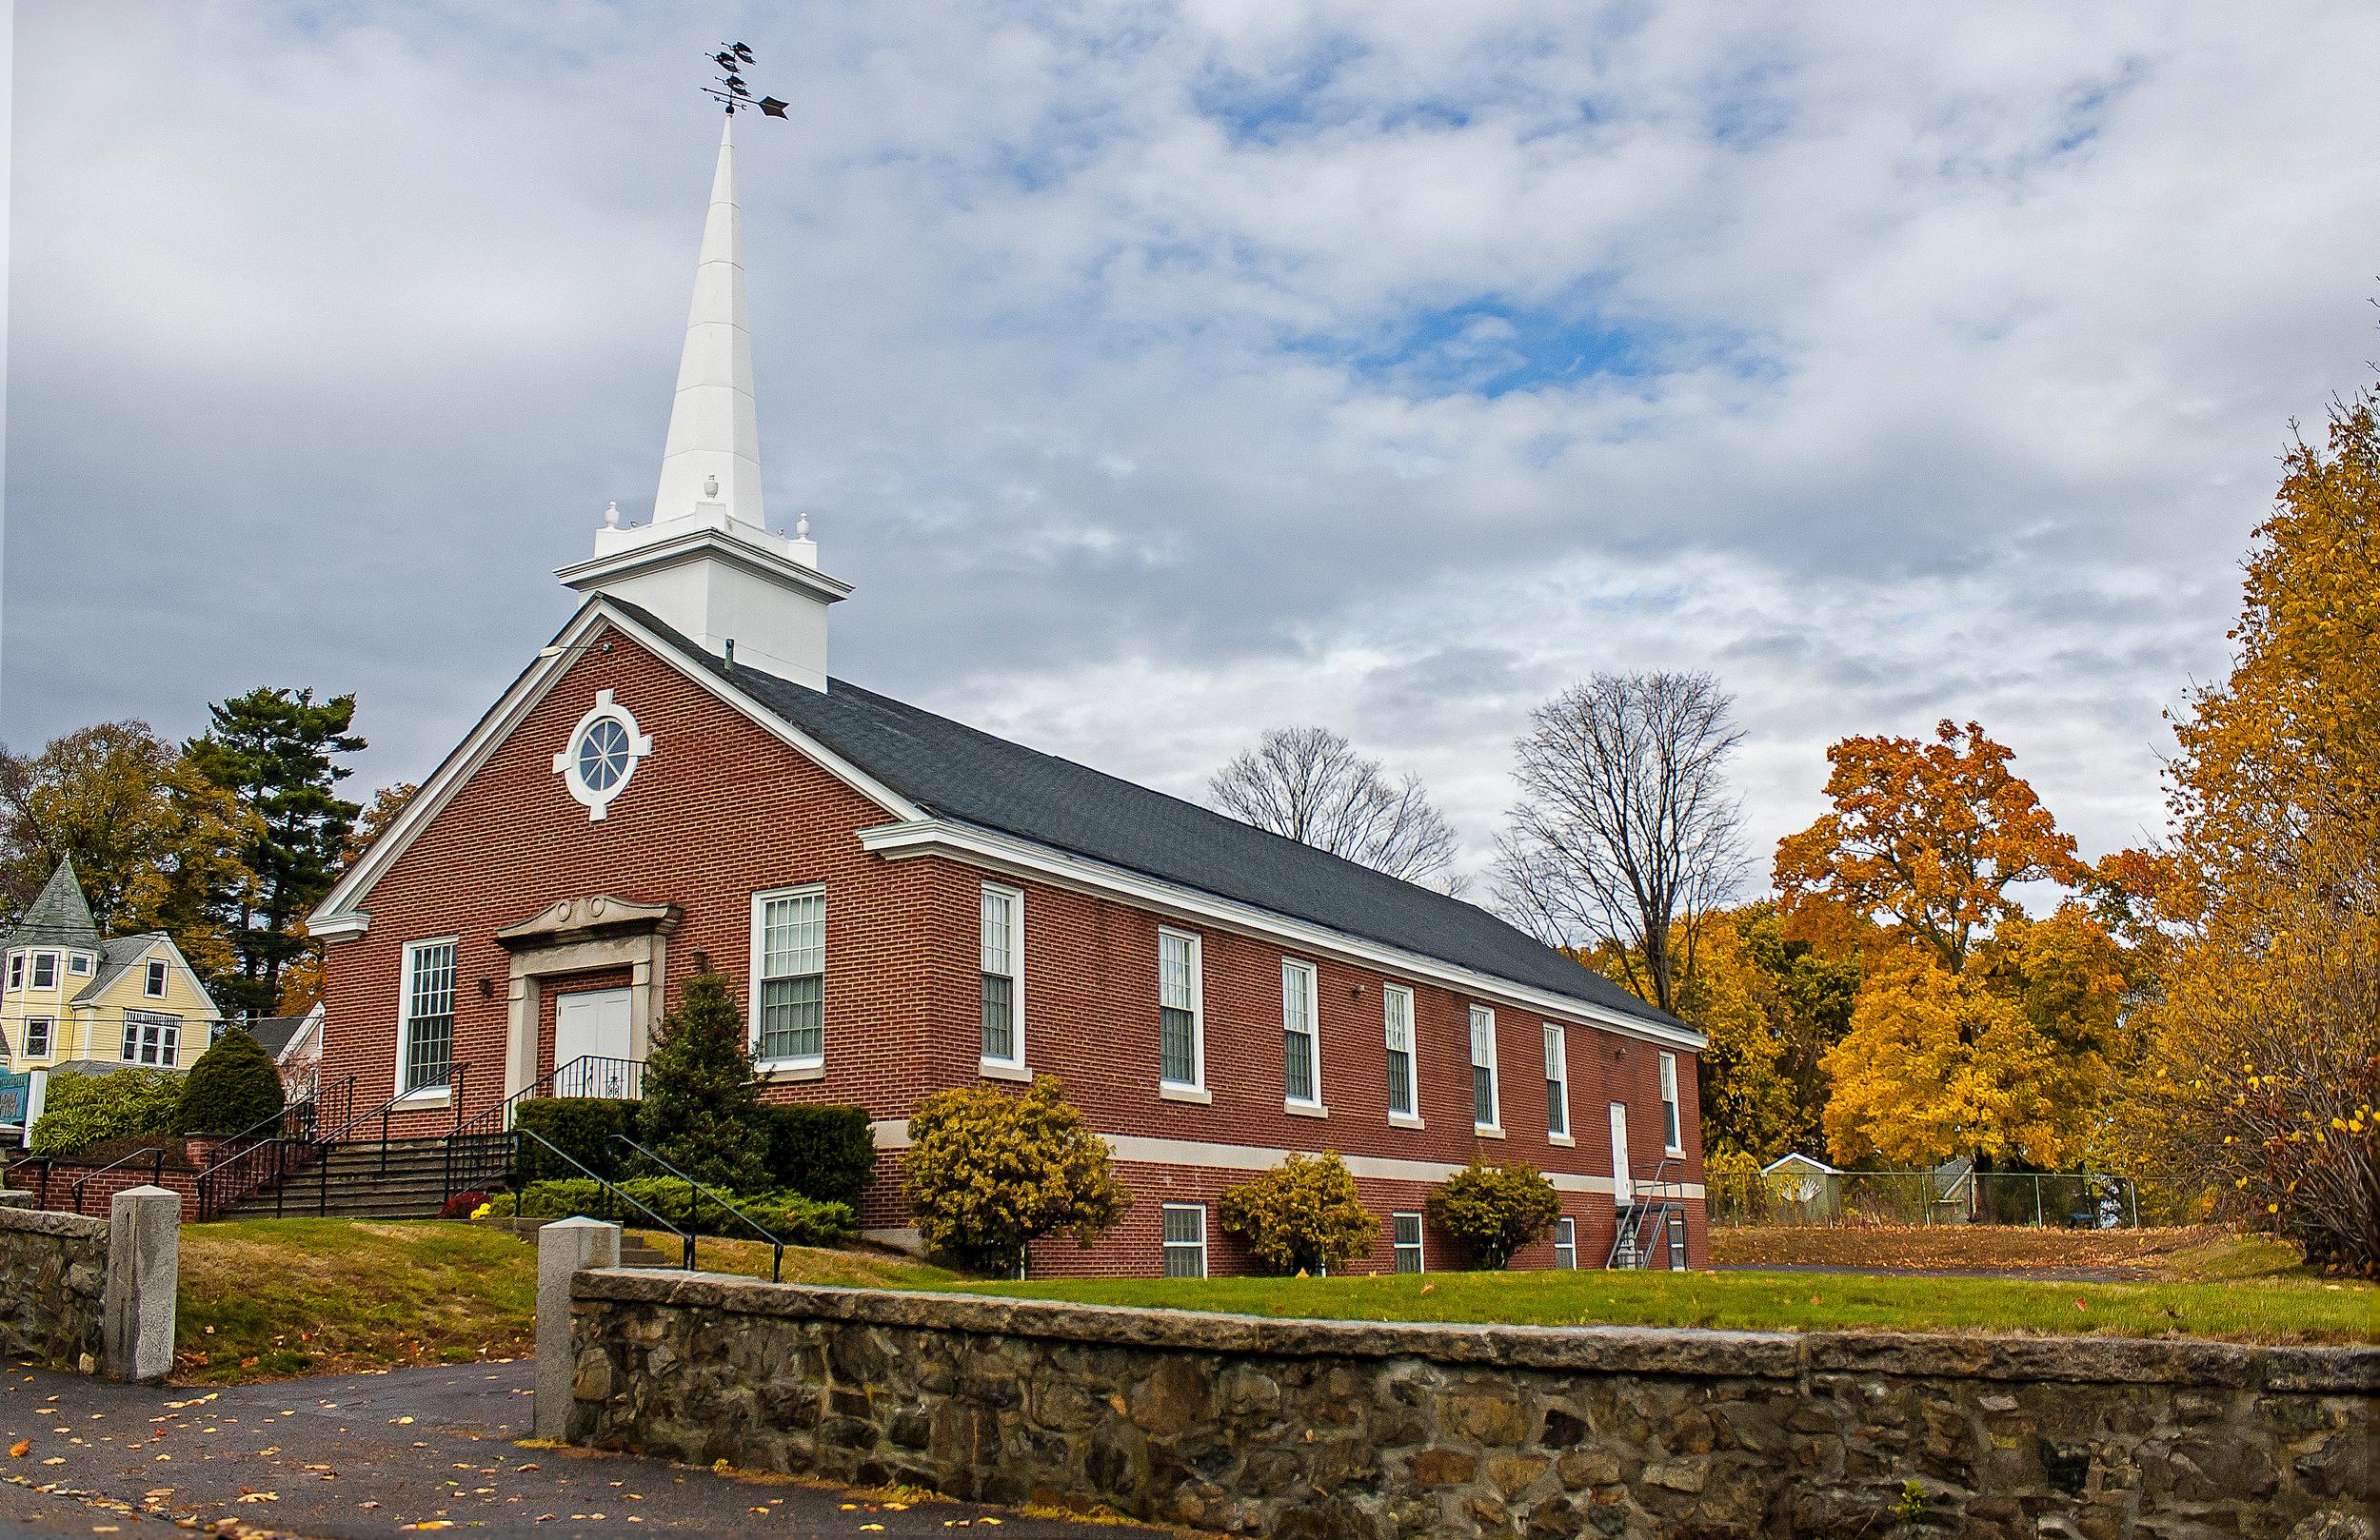 Stoneham Memorial Seventh-day Adventist Church